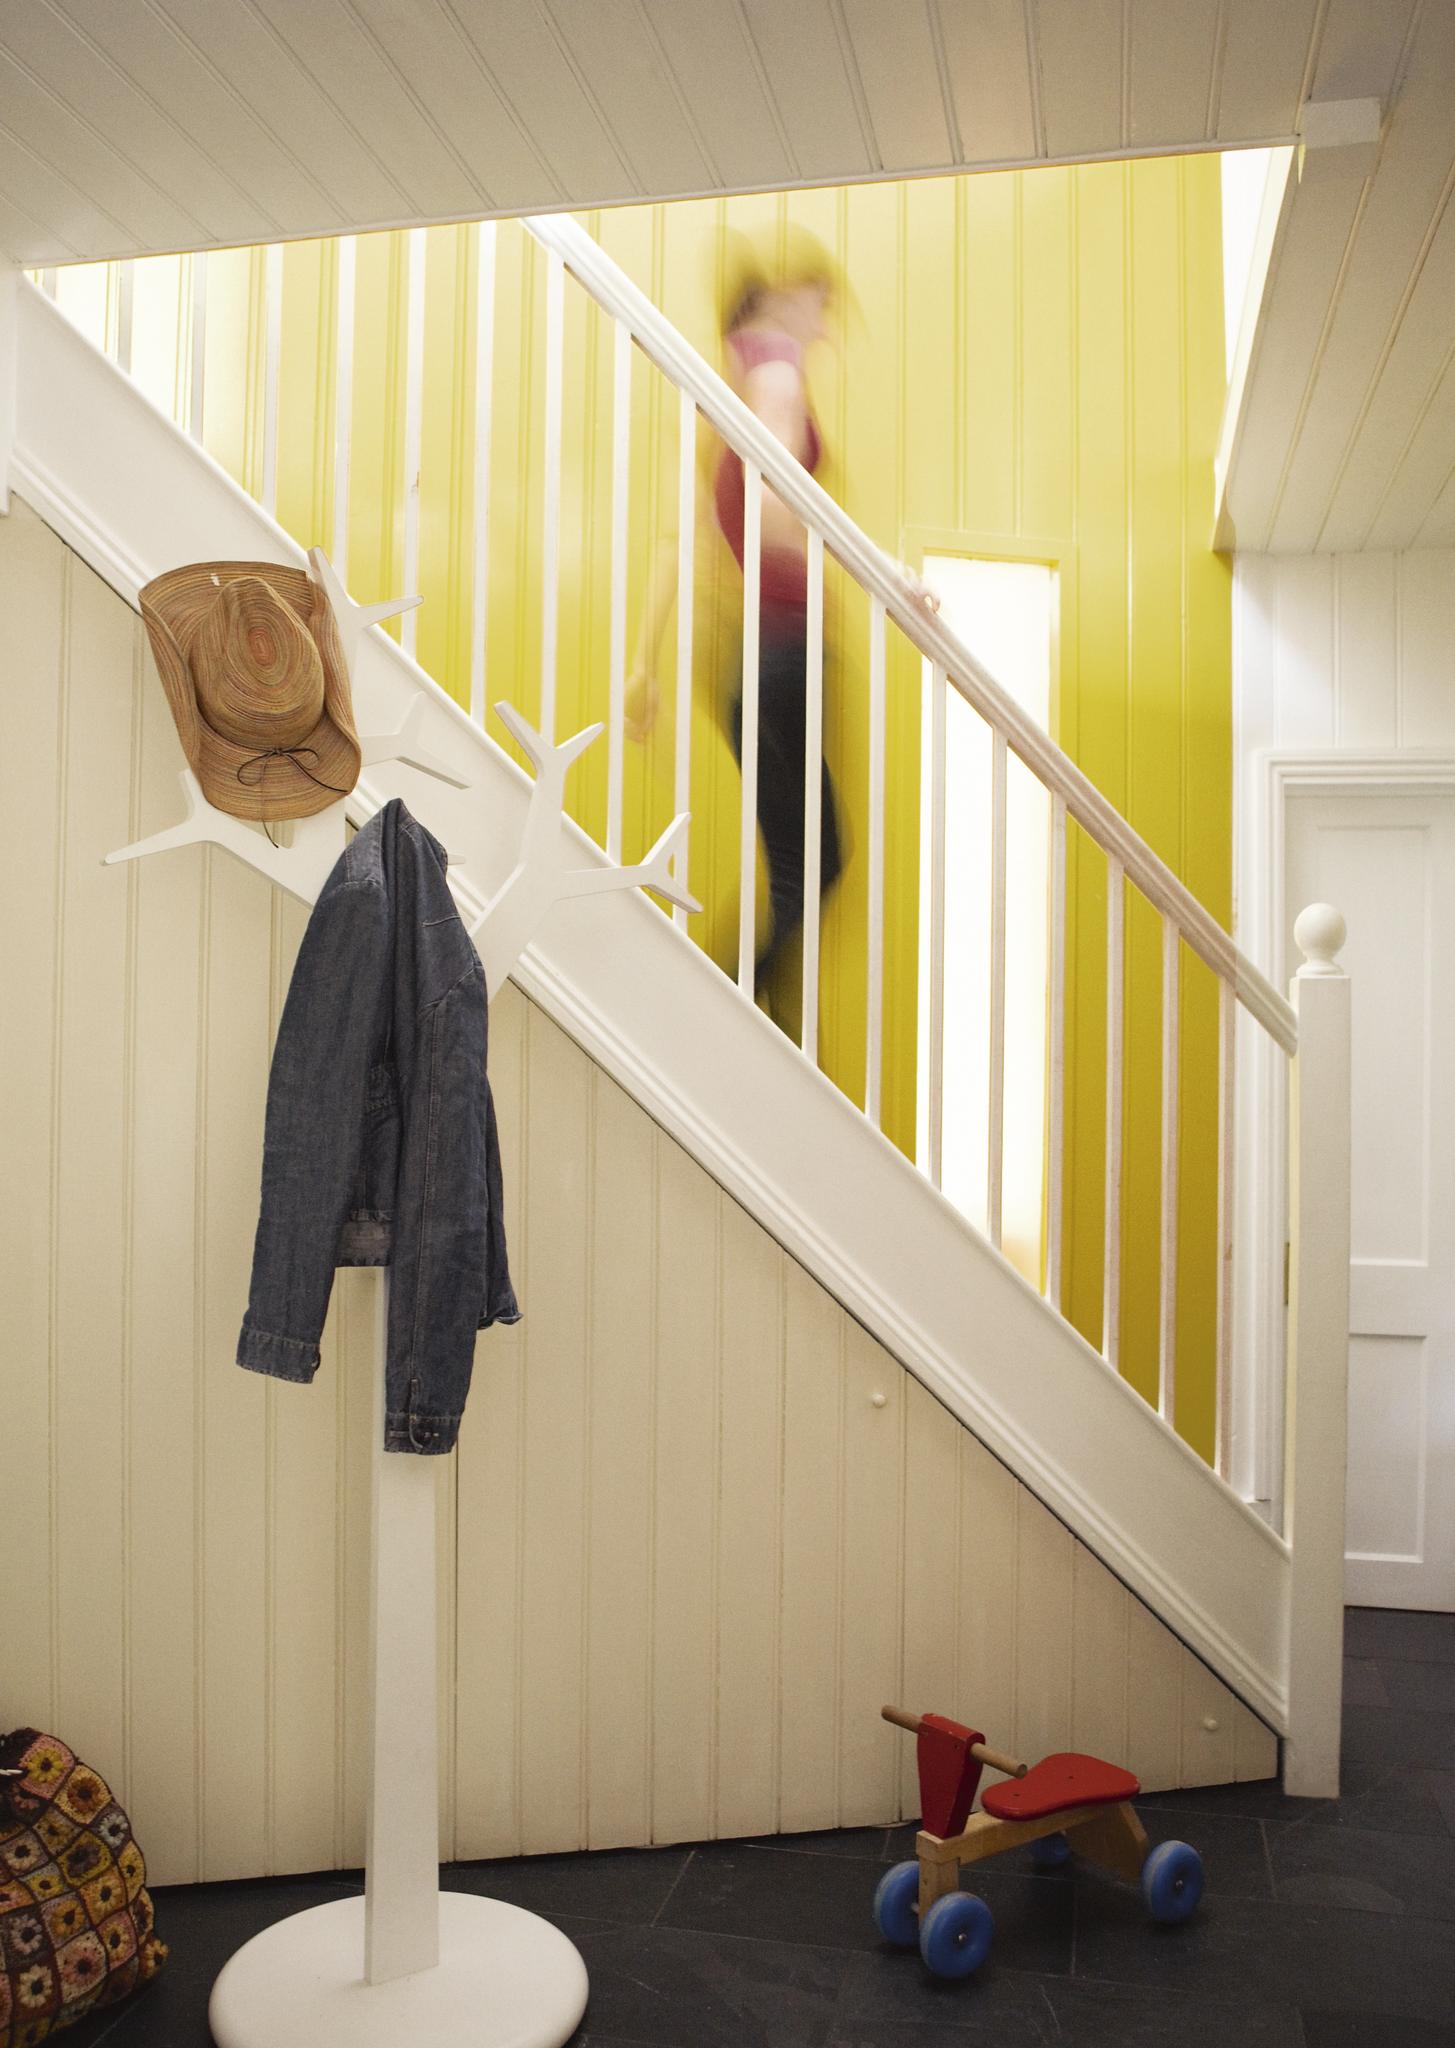 Kul trappor   nordsjö idé & design